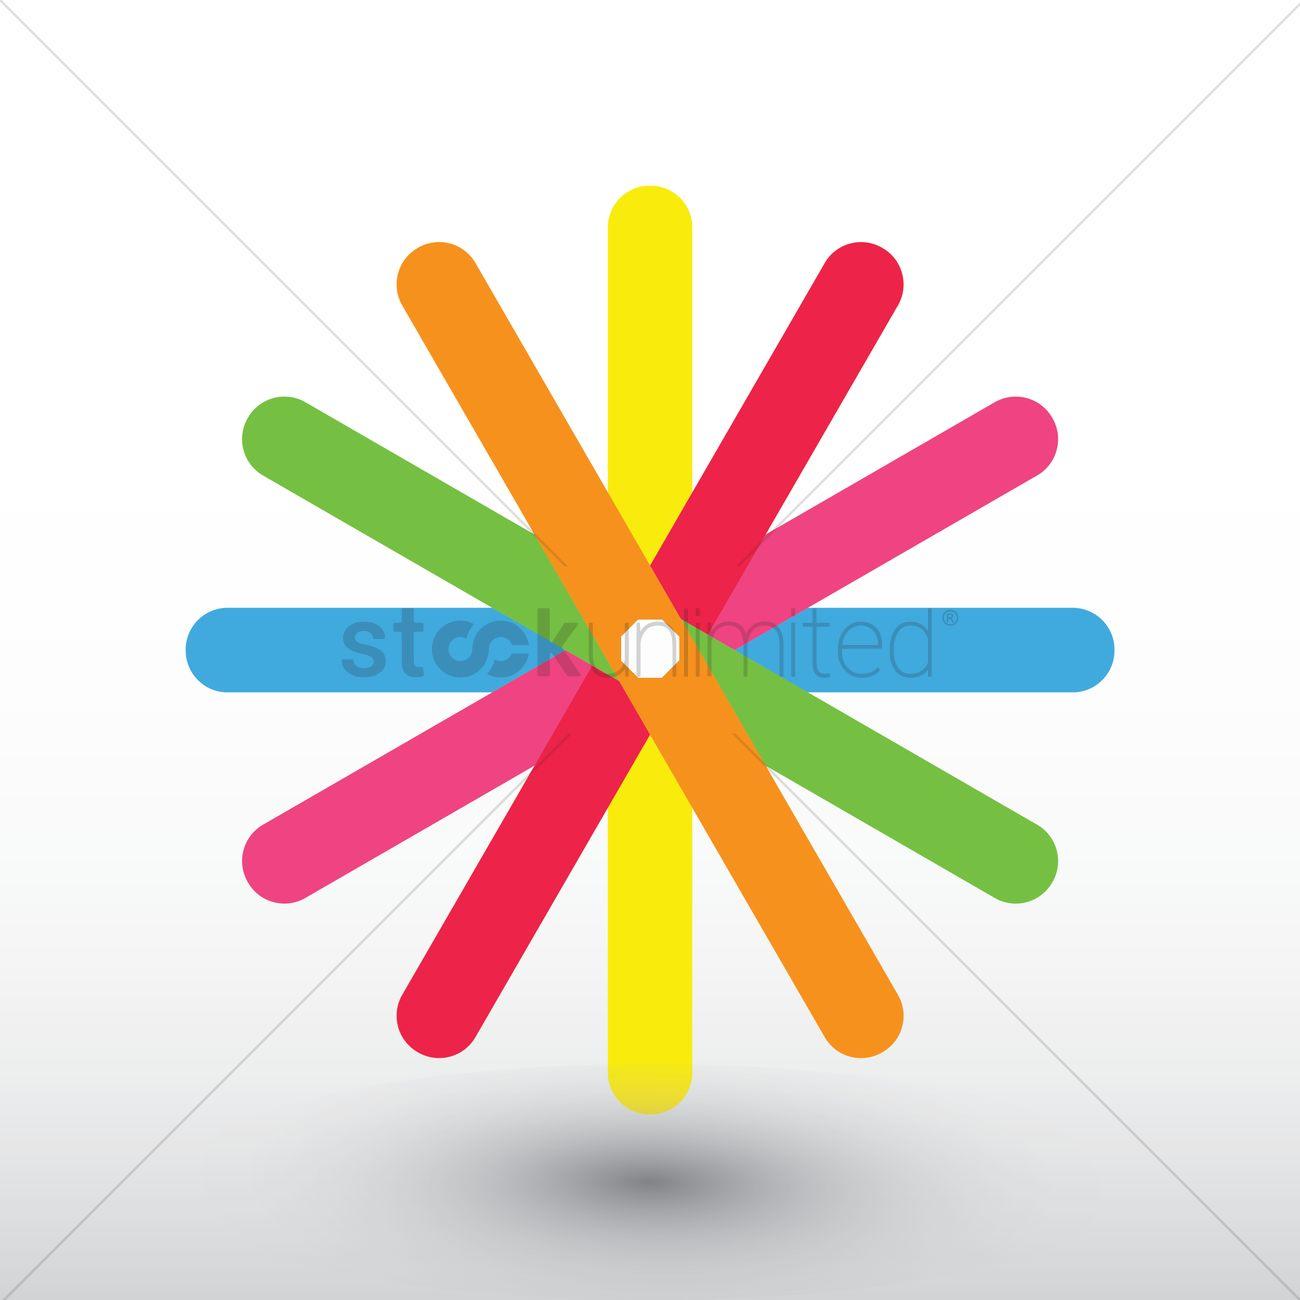 Flower Logo Element Vector Image 1627630 Stockunlimited